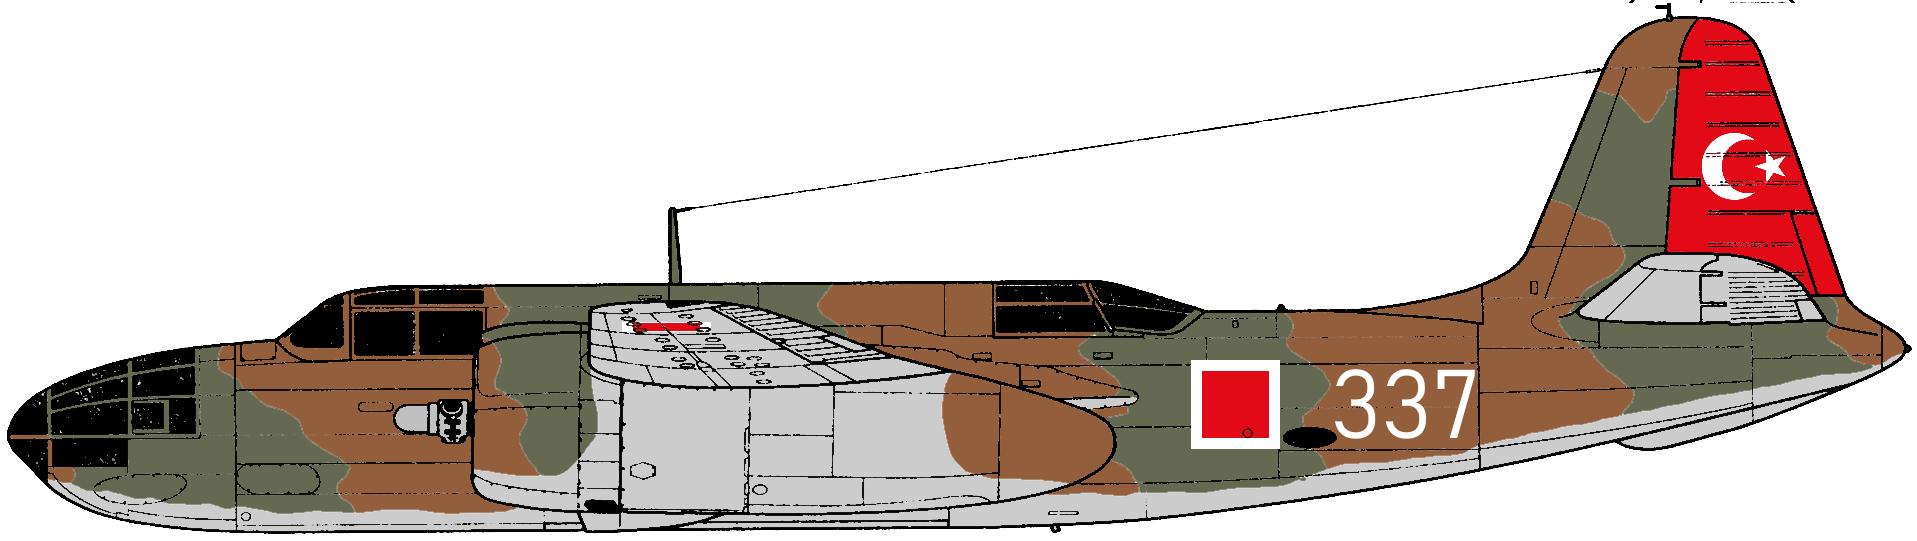 DB-7.png